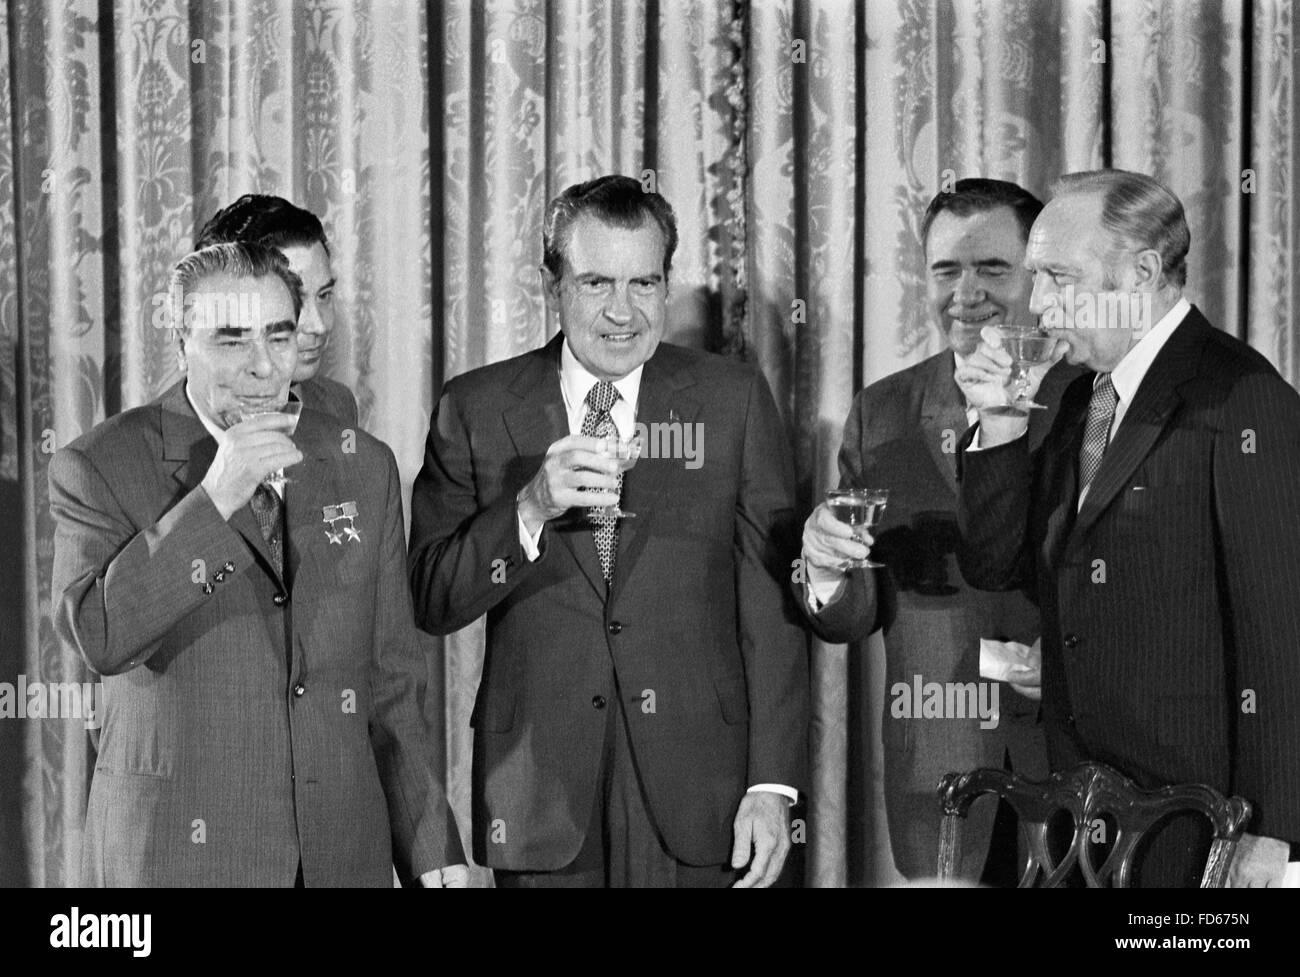 Nixon and Breshnev. President Richard Nixon with (left to right) Soviet leader Leonid Brezhnev, Soviet Minister - Stock Image